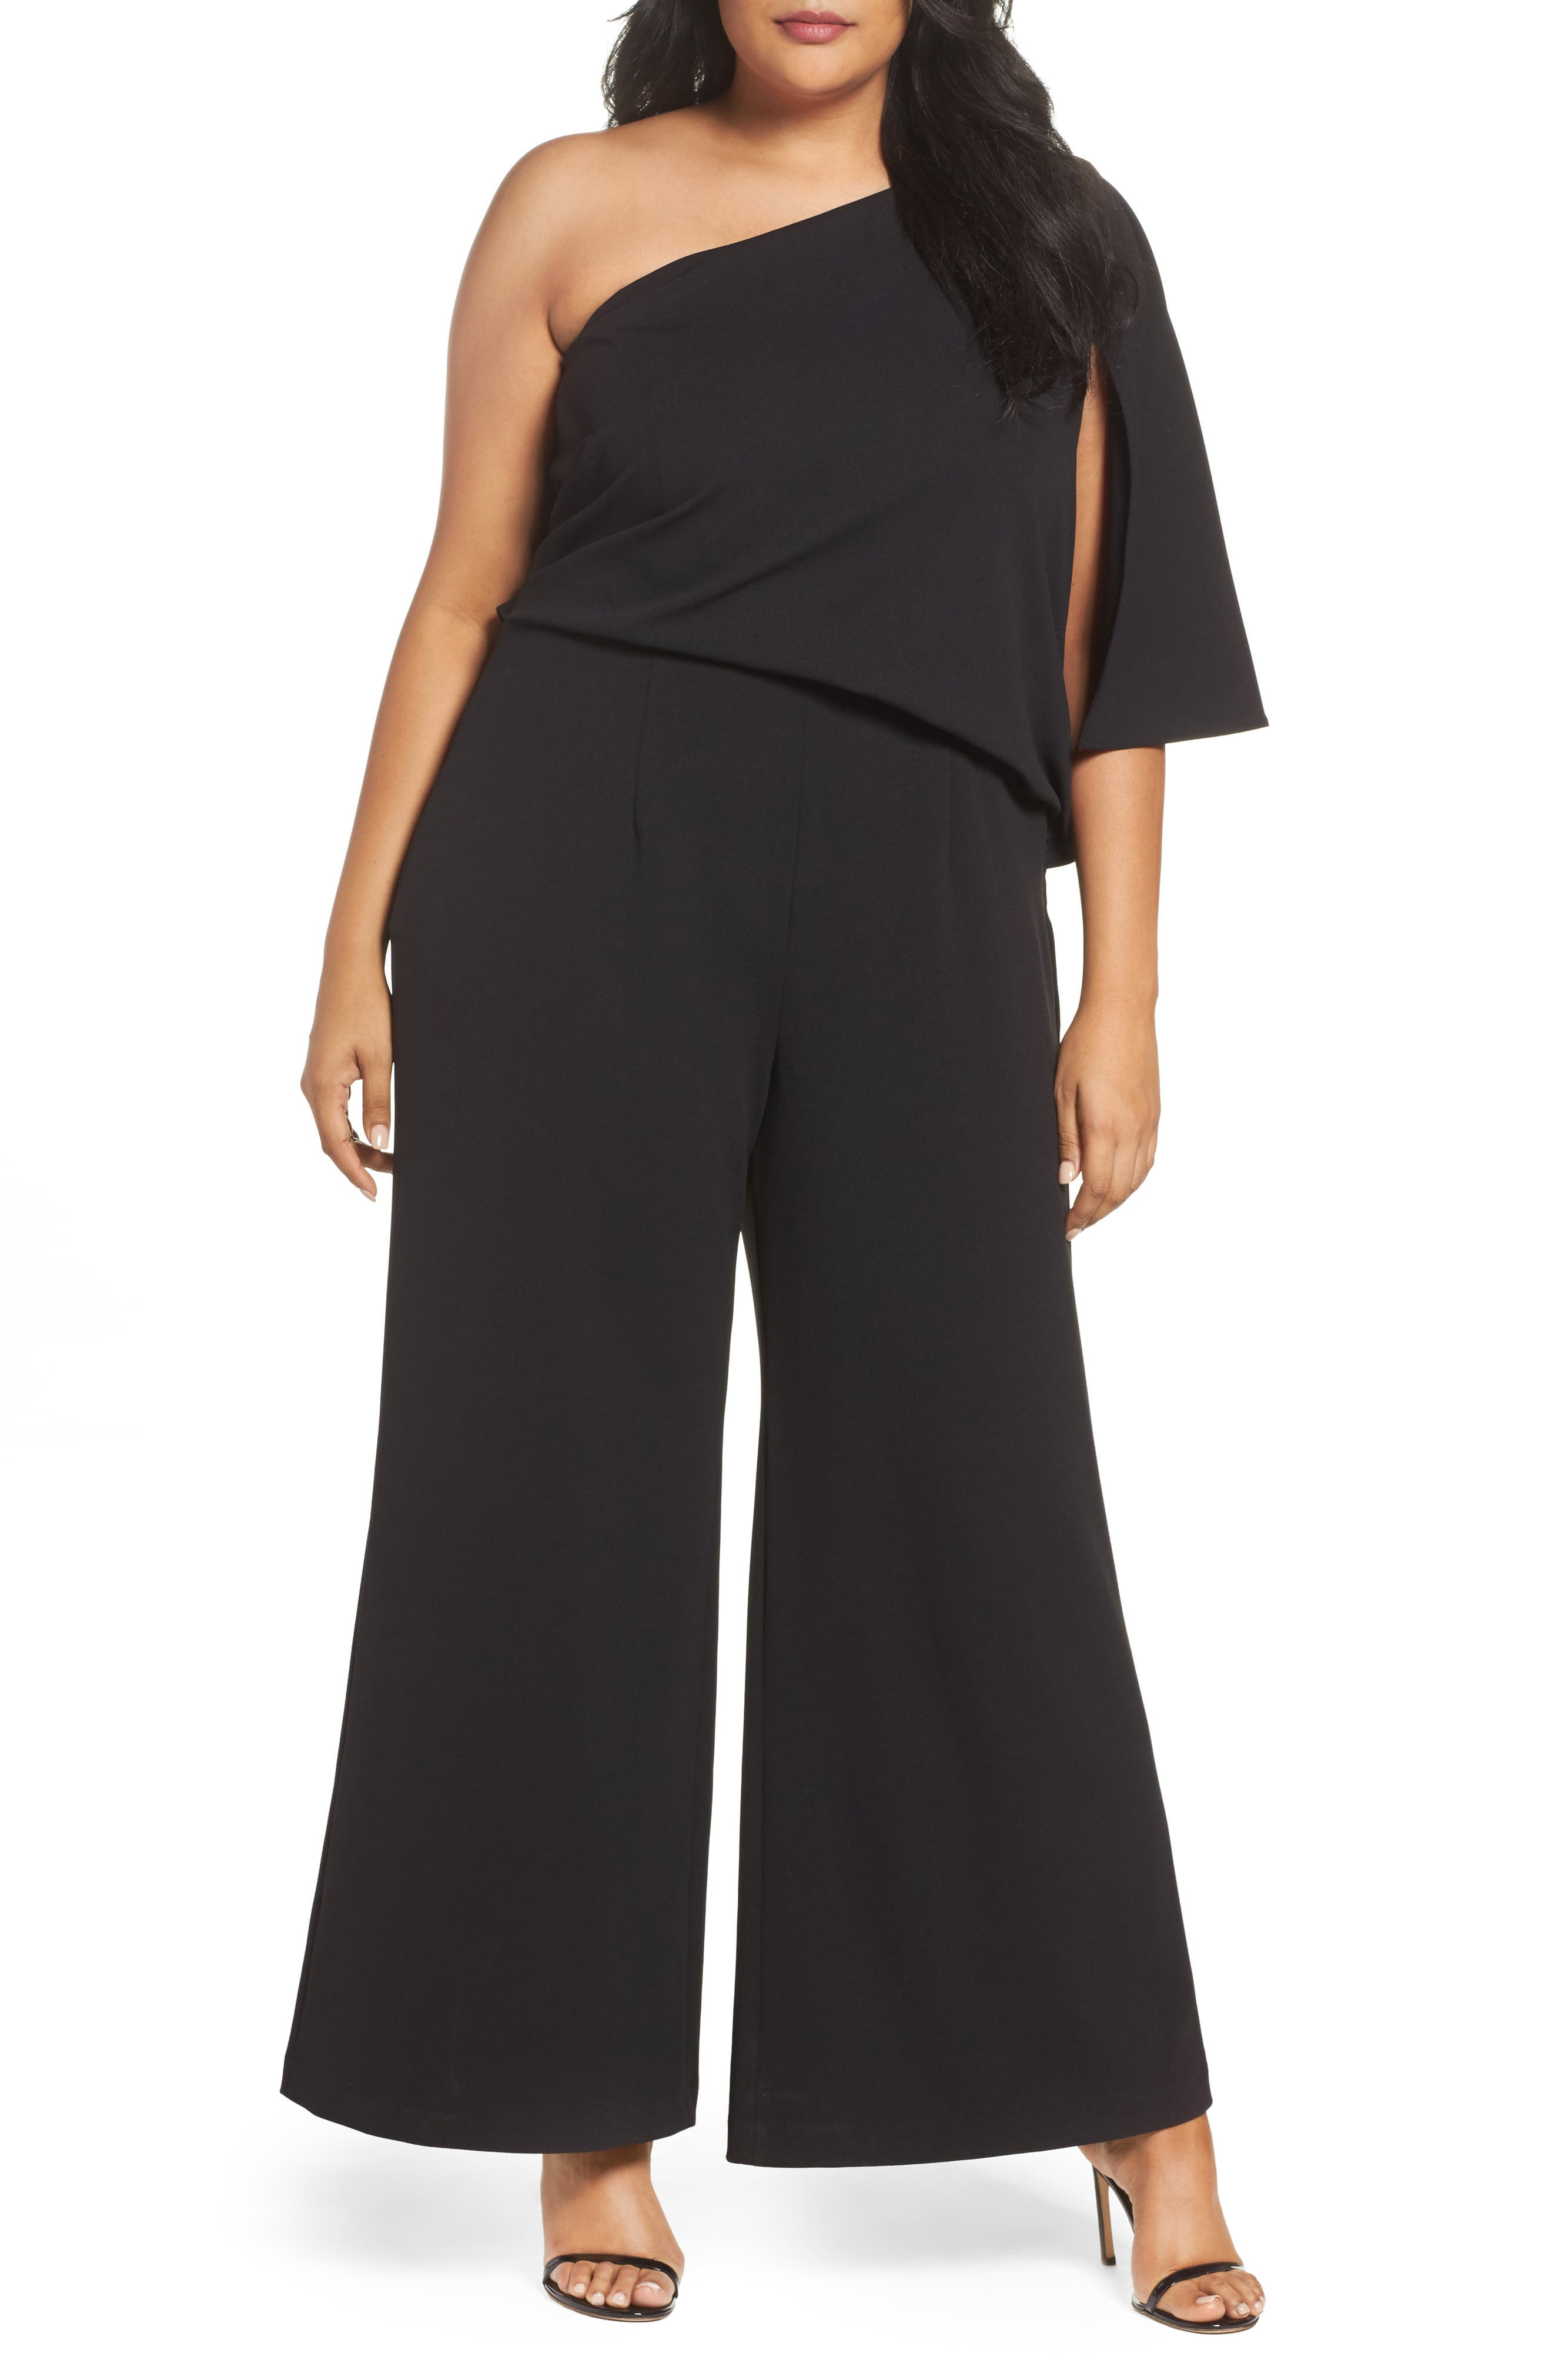 Adrianna Papell One-Shoulder Knit Crepe Jumpsuit (Plus Size)